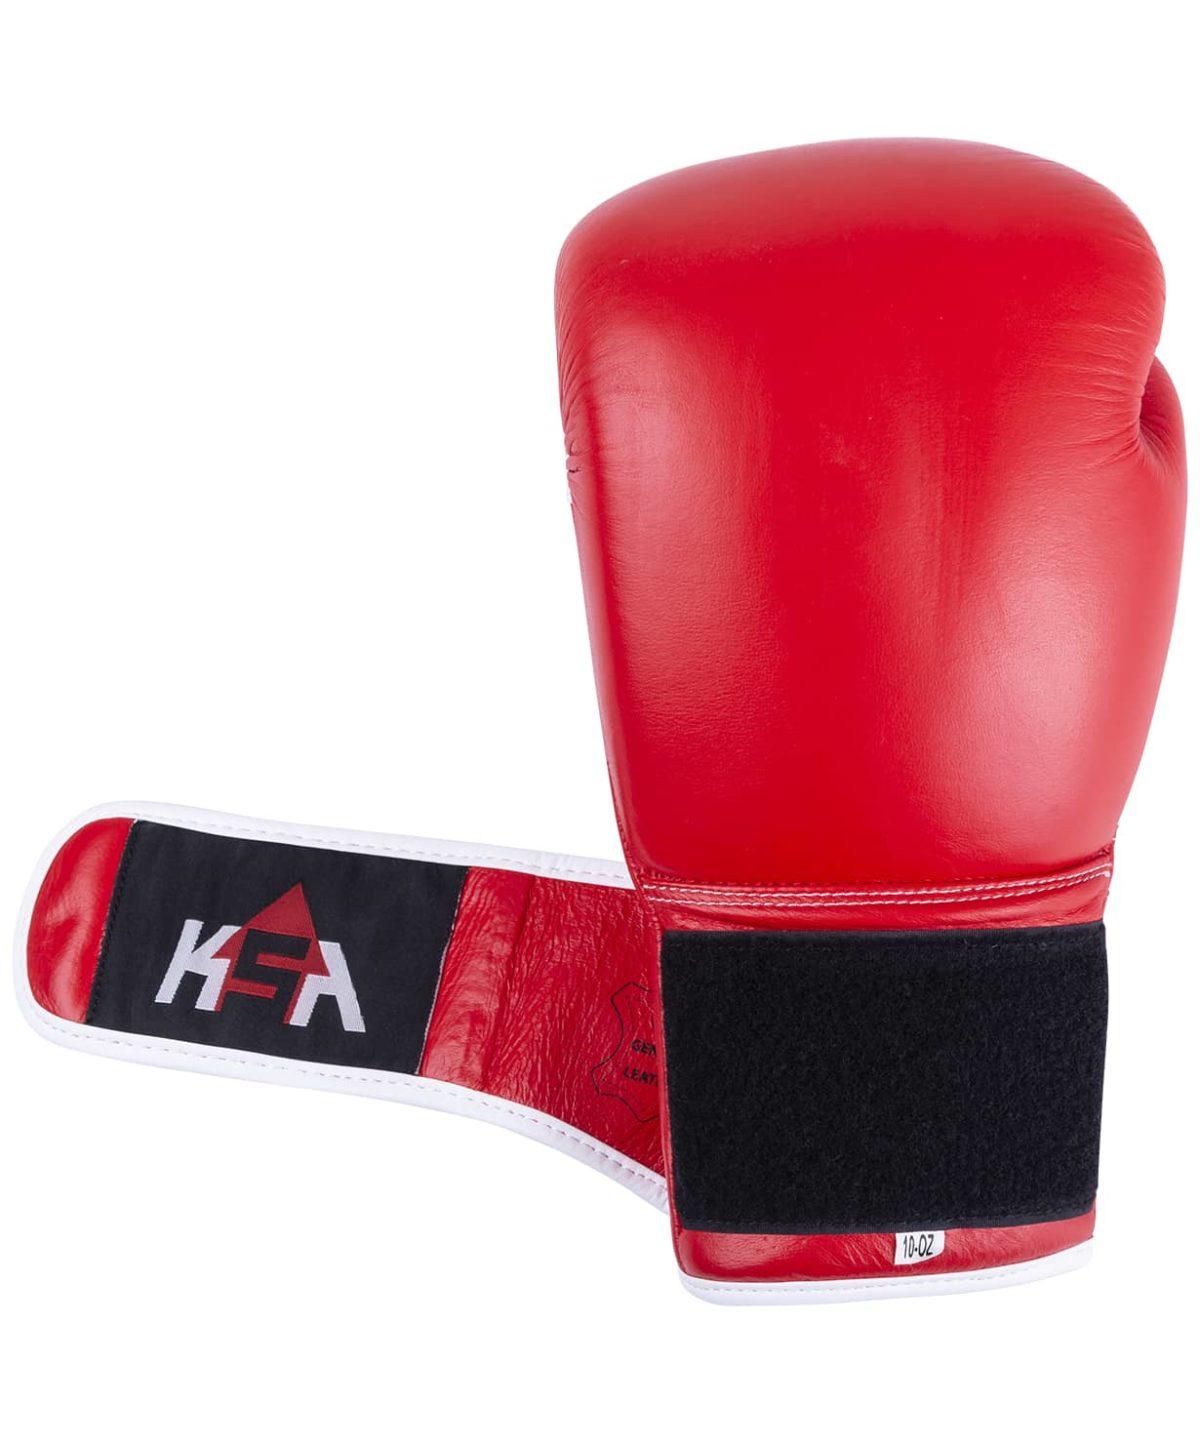 KSA Wolf Red Перчатки боксерские, 12 oz, кожа 17837 - 3